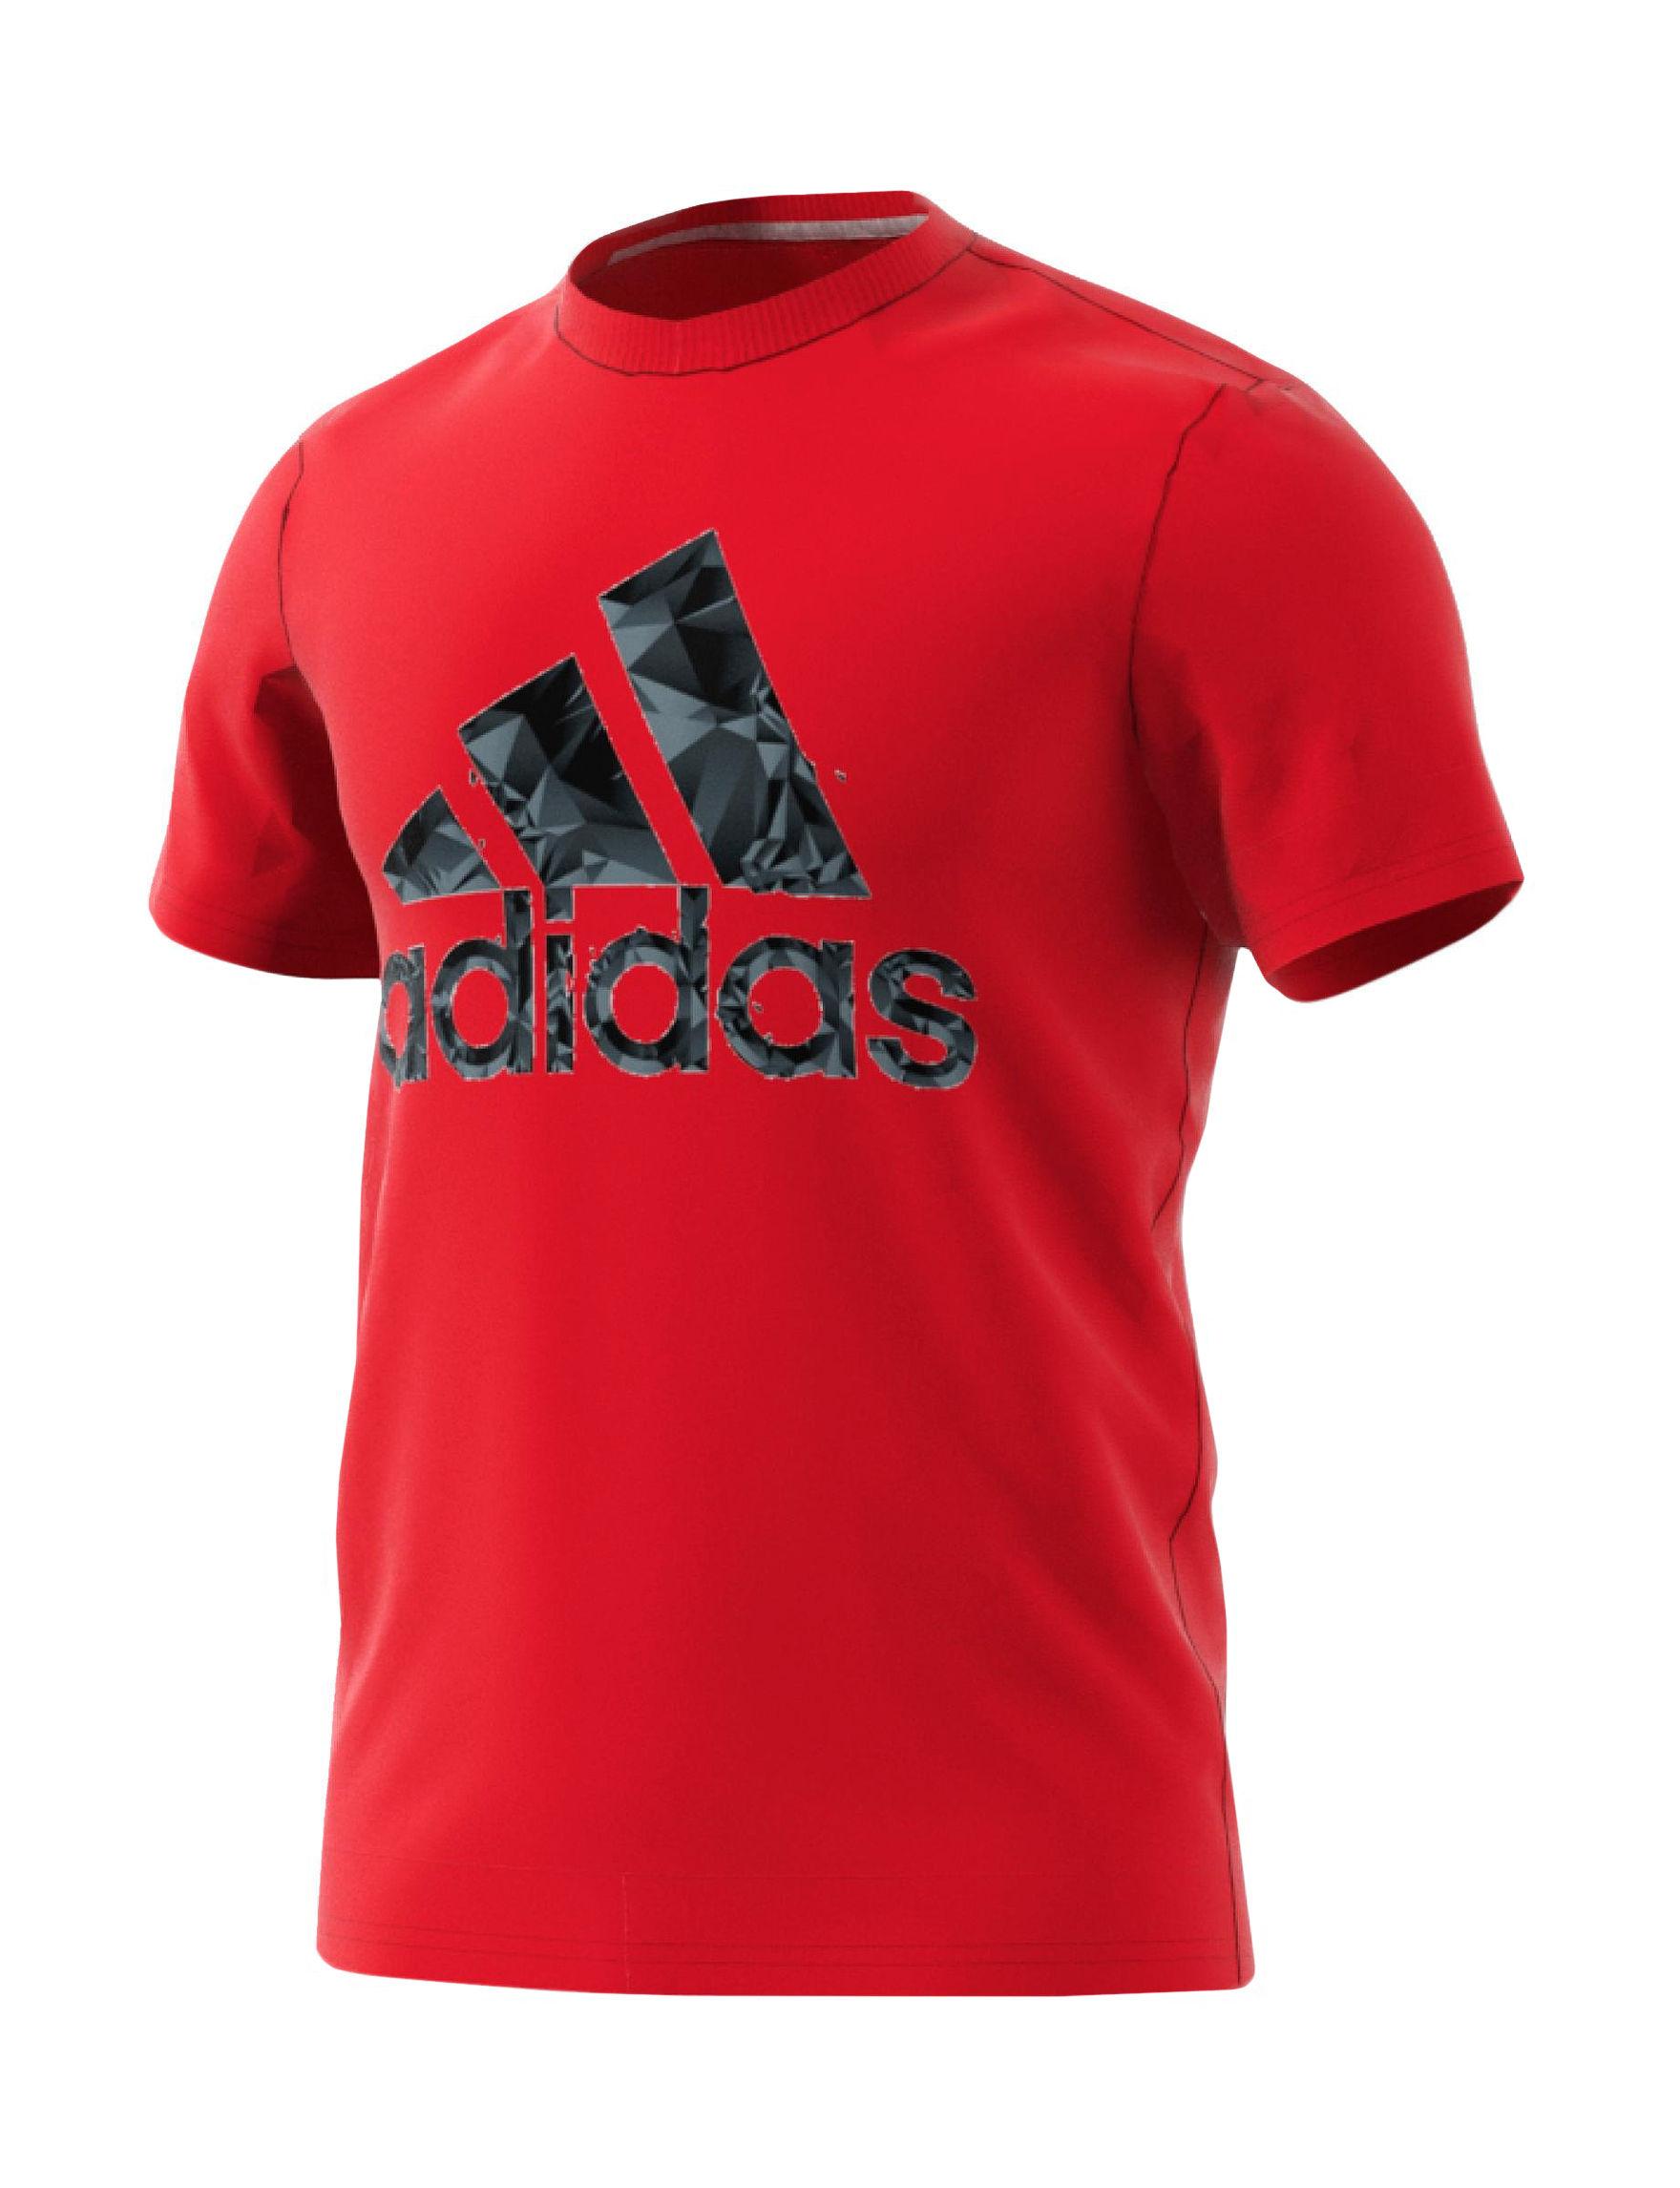 Adidas Scarlet Tees & Tanks